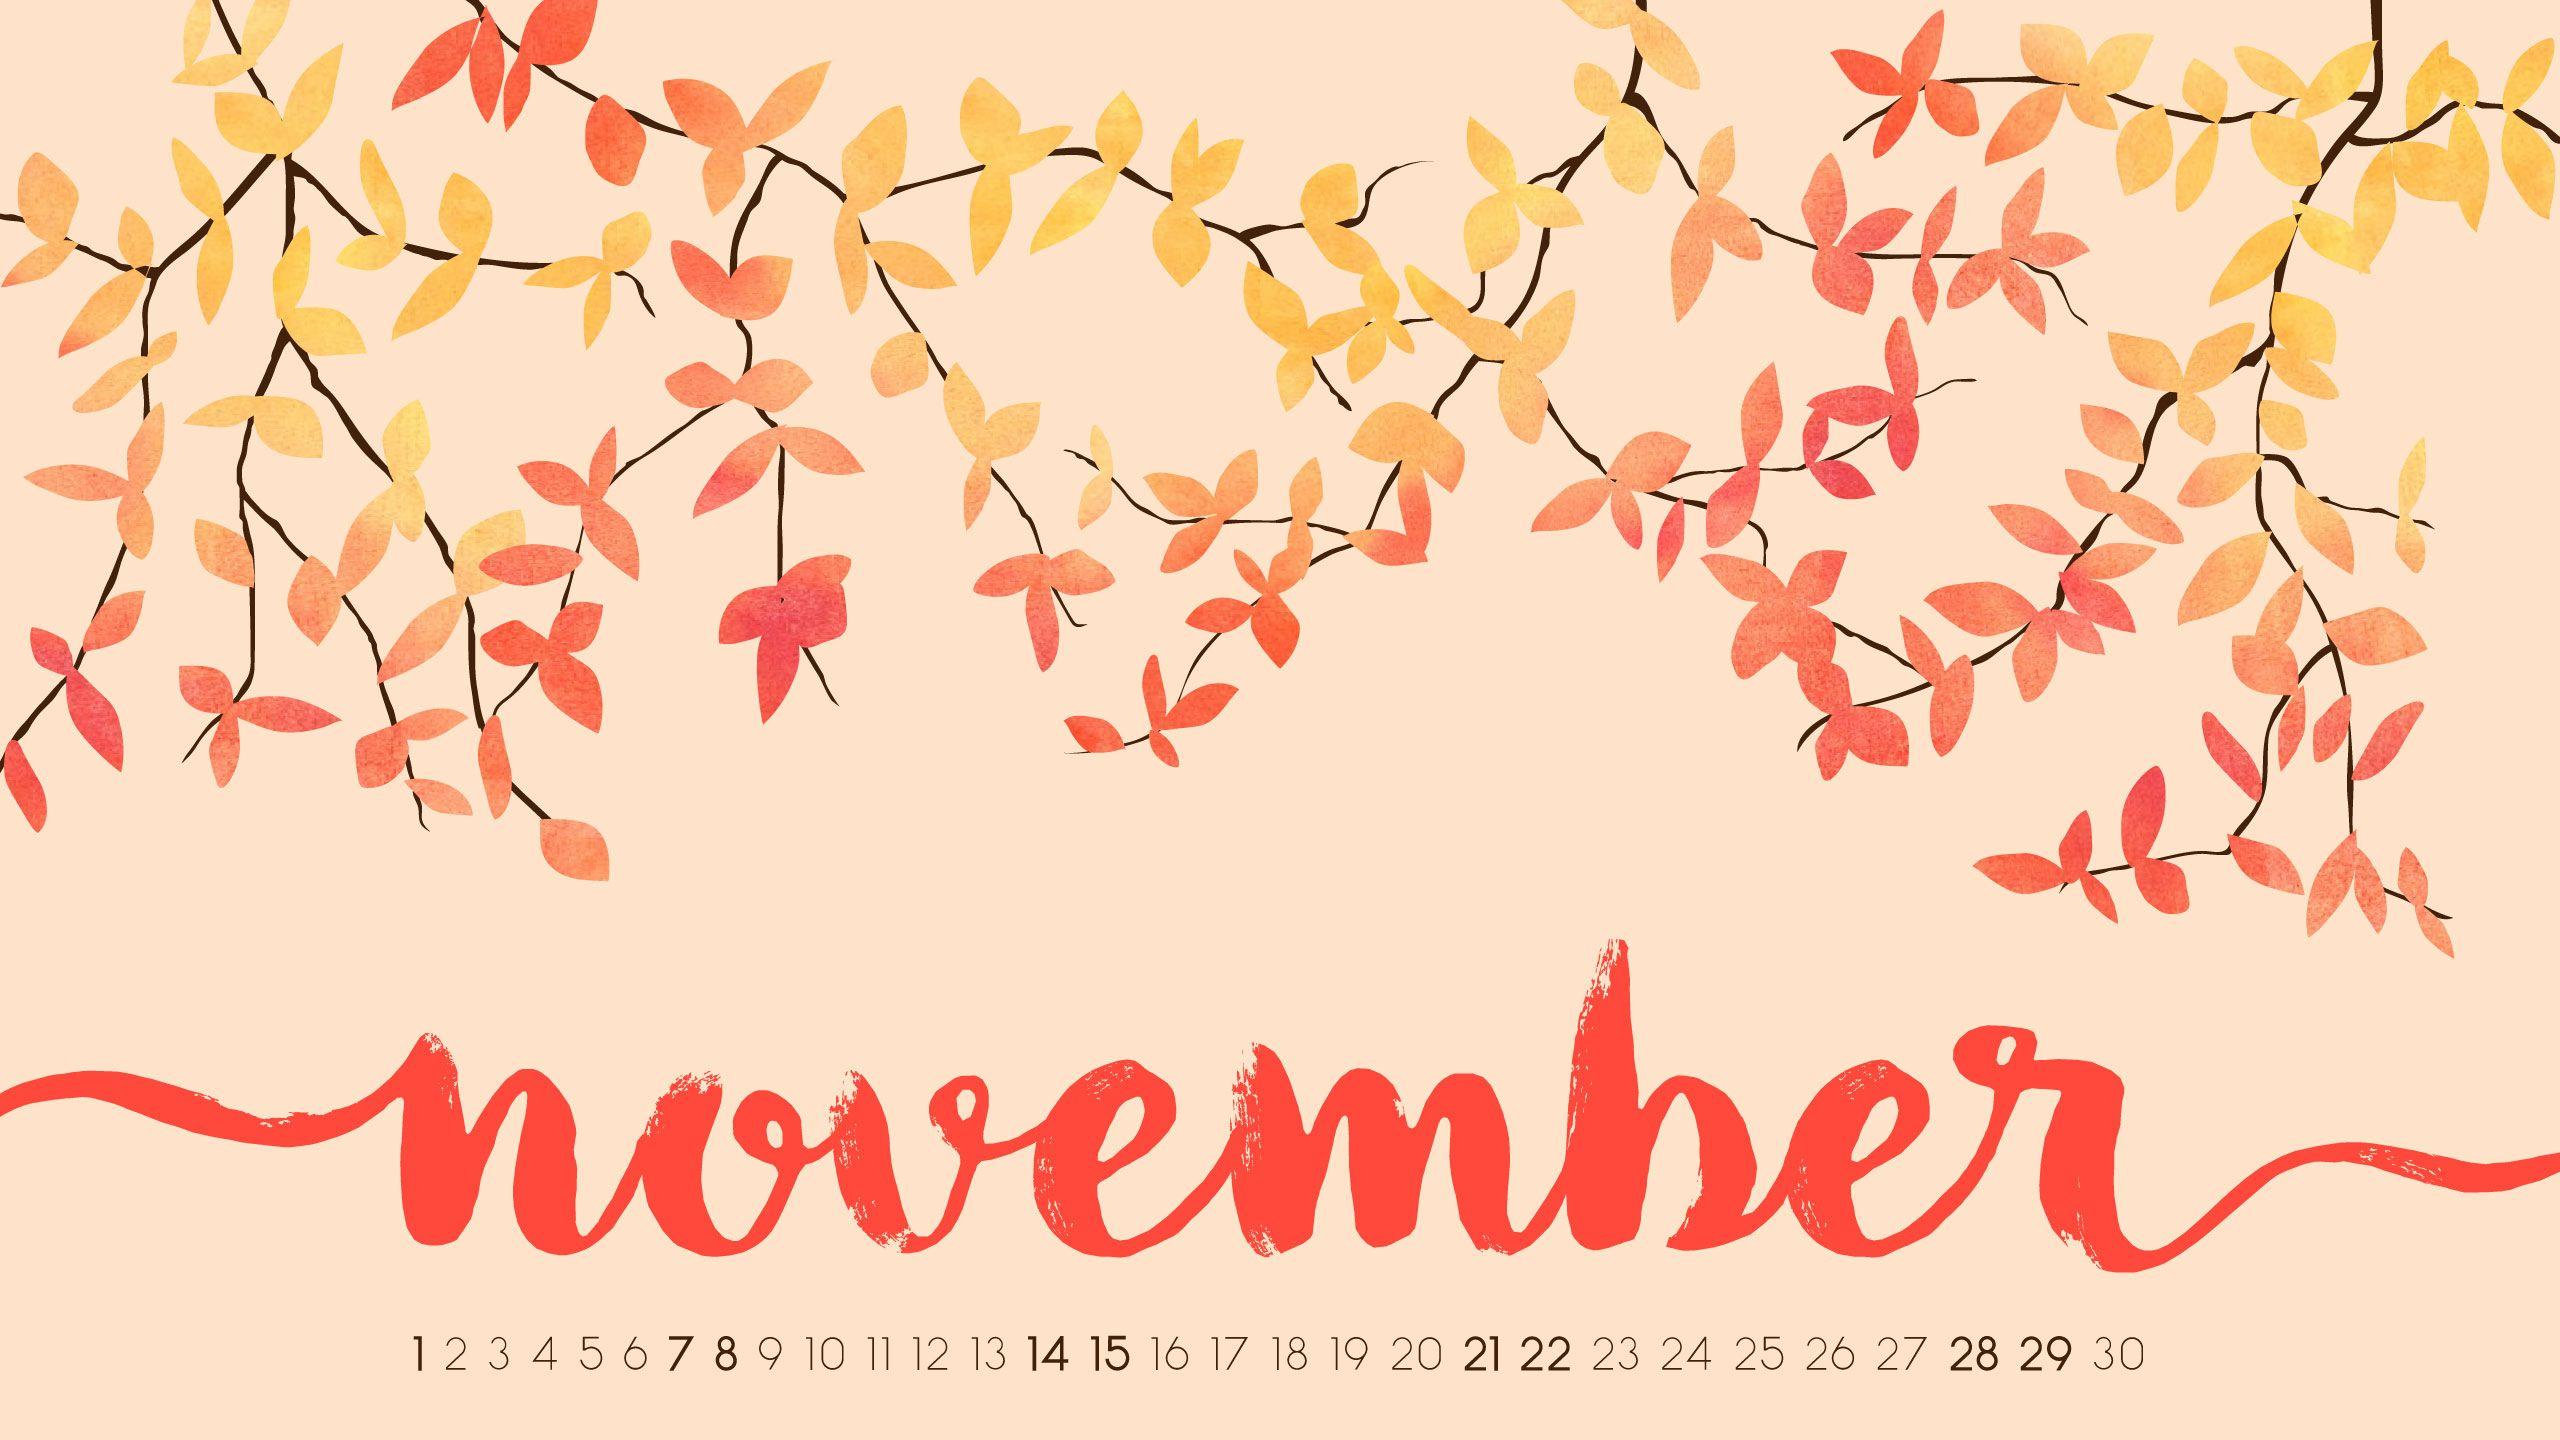 November Desktop Wallpapers